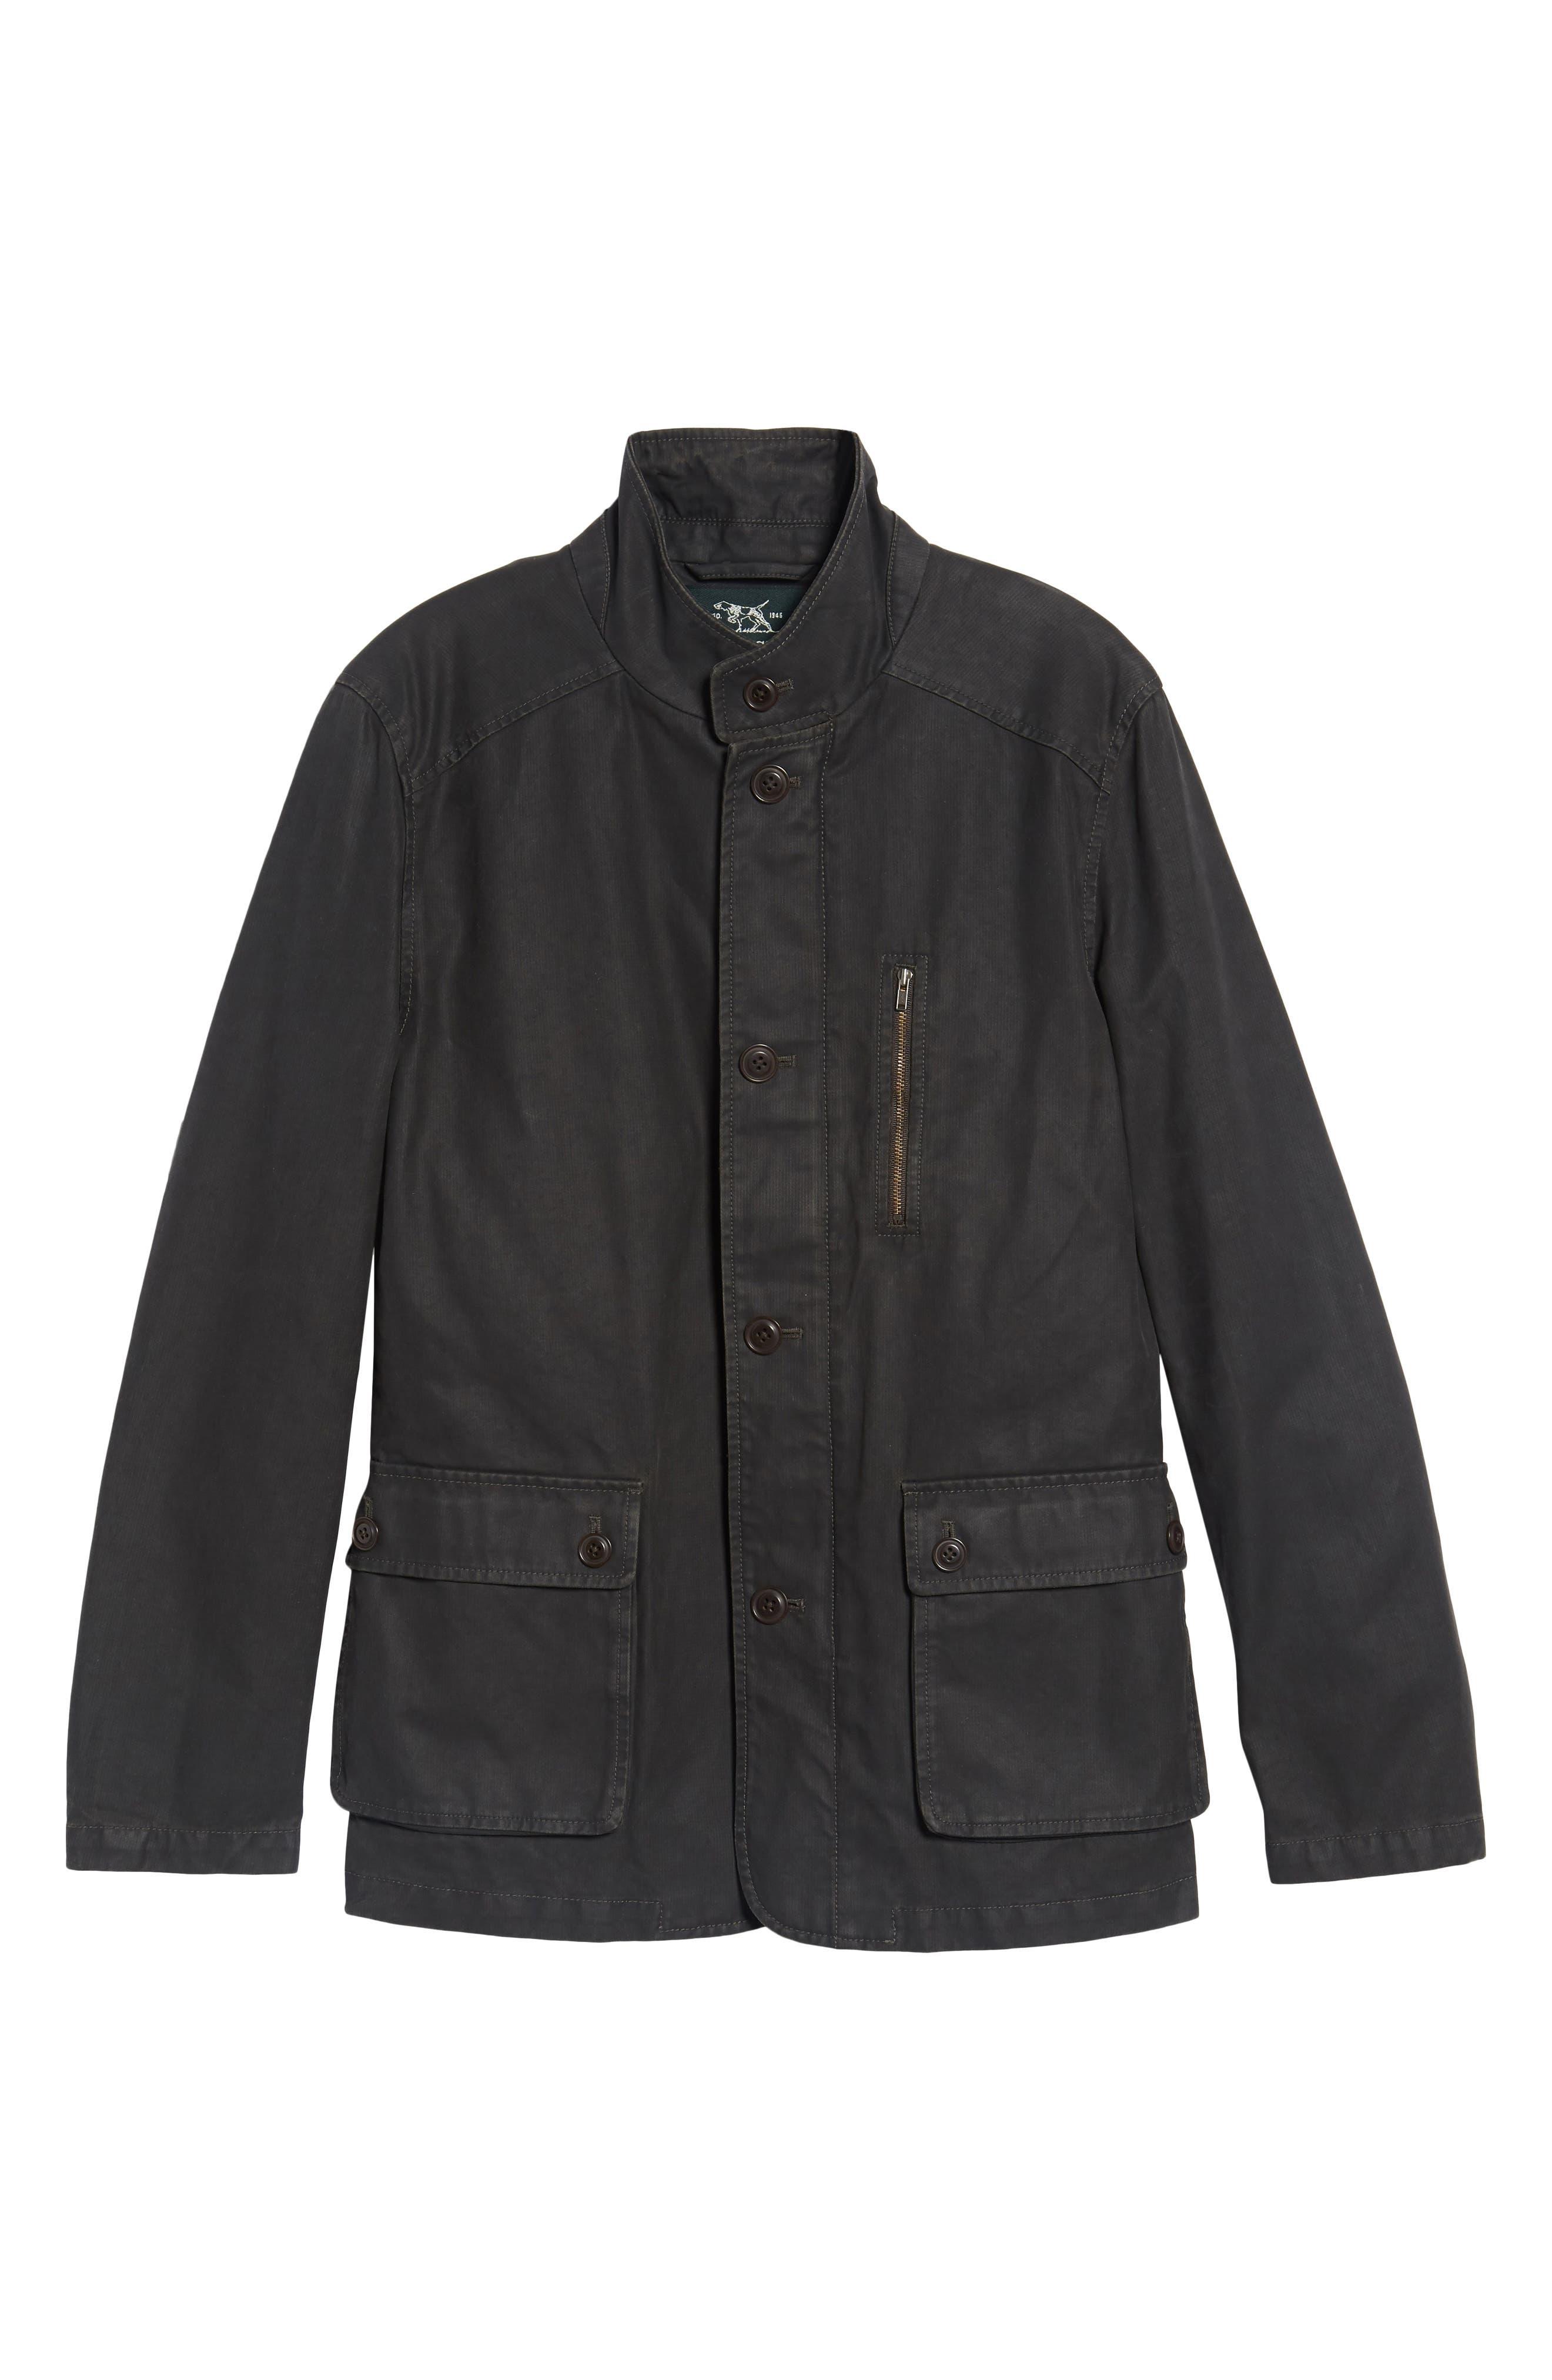 Blackmount Water-Resistant Jacket,                             Alternate thumbnail 5, color,                             302